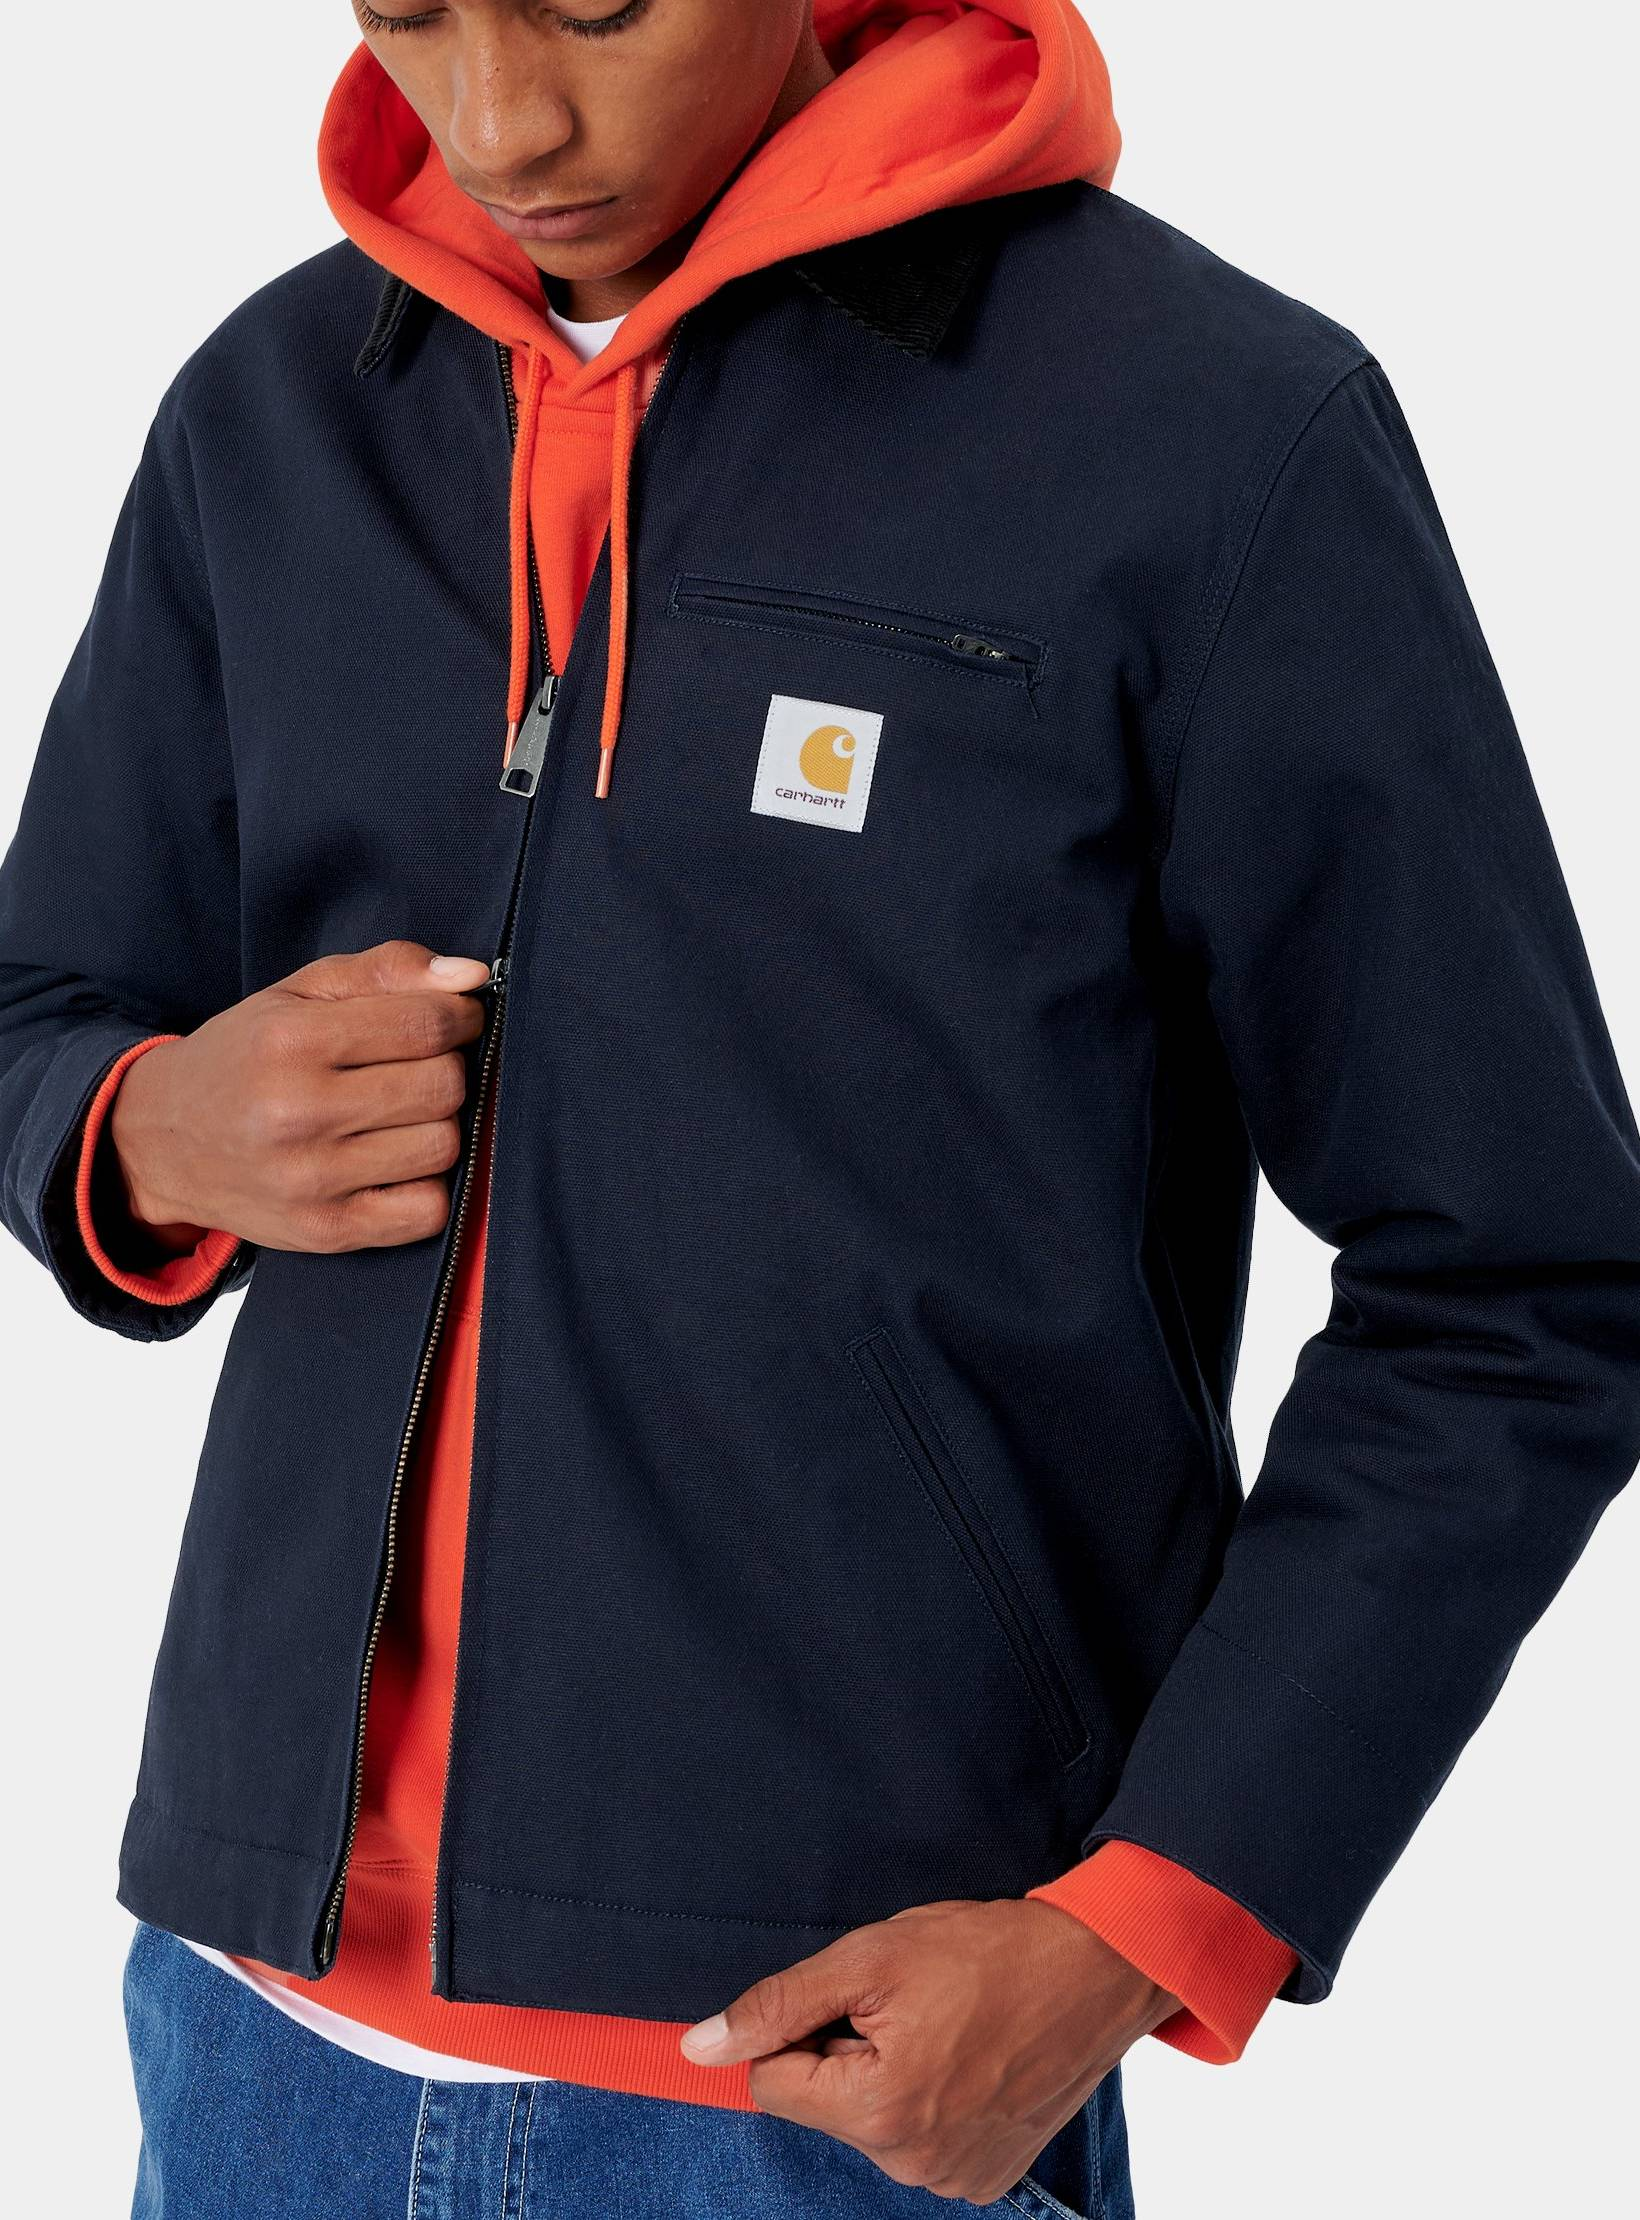 Jacket Carhartt Og Detroit Jacket Size M Dark Navy Rigid